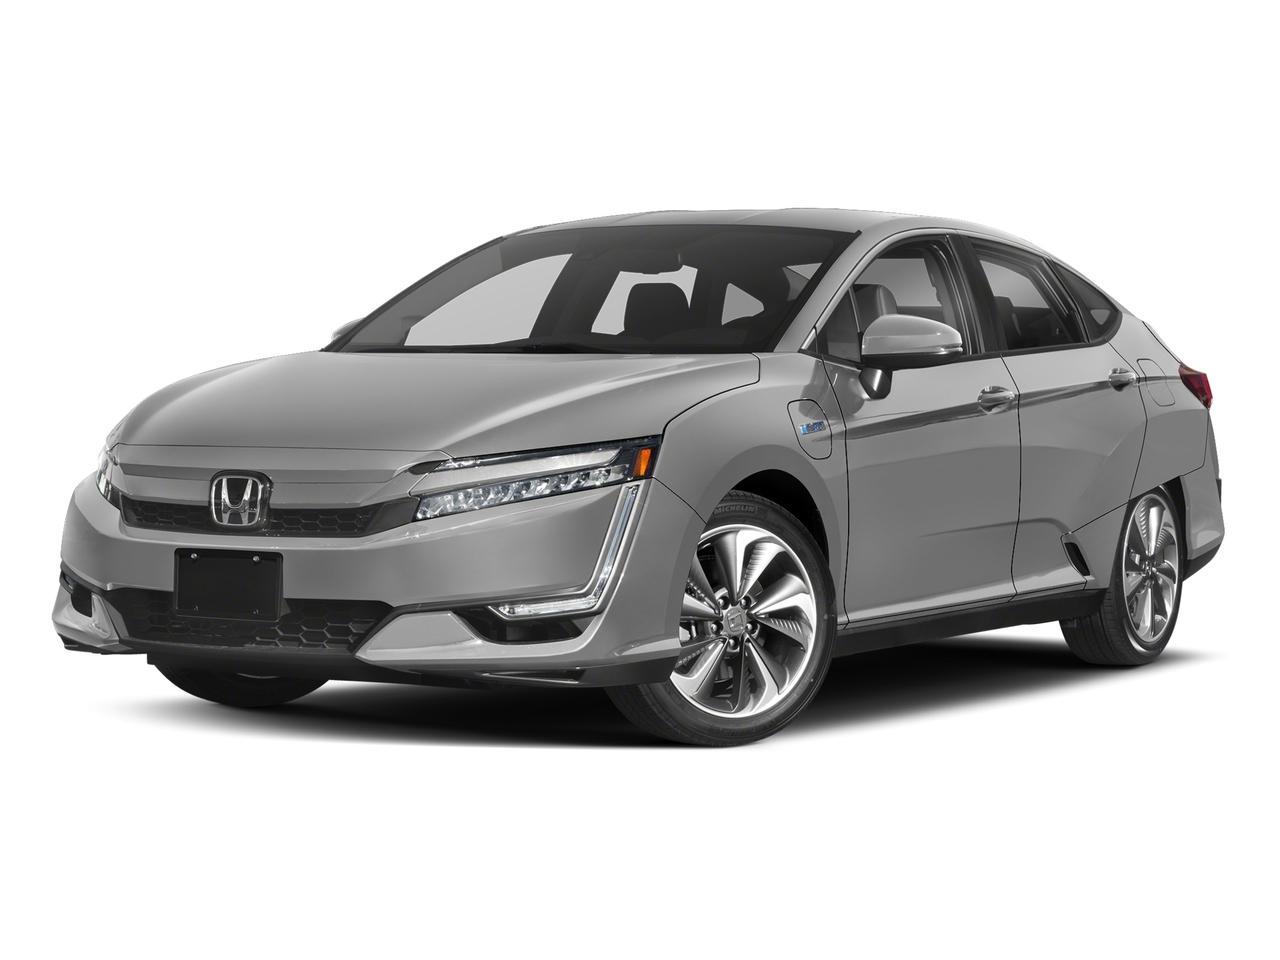 2018 Honda Clarity Plug-In Hybrid Vehicle Photo in Akron, OH 44320